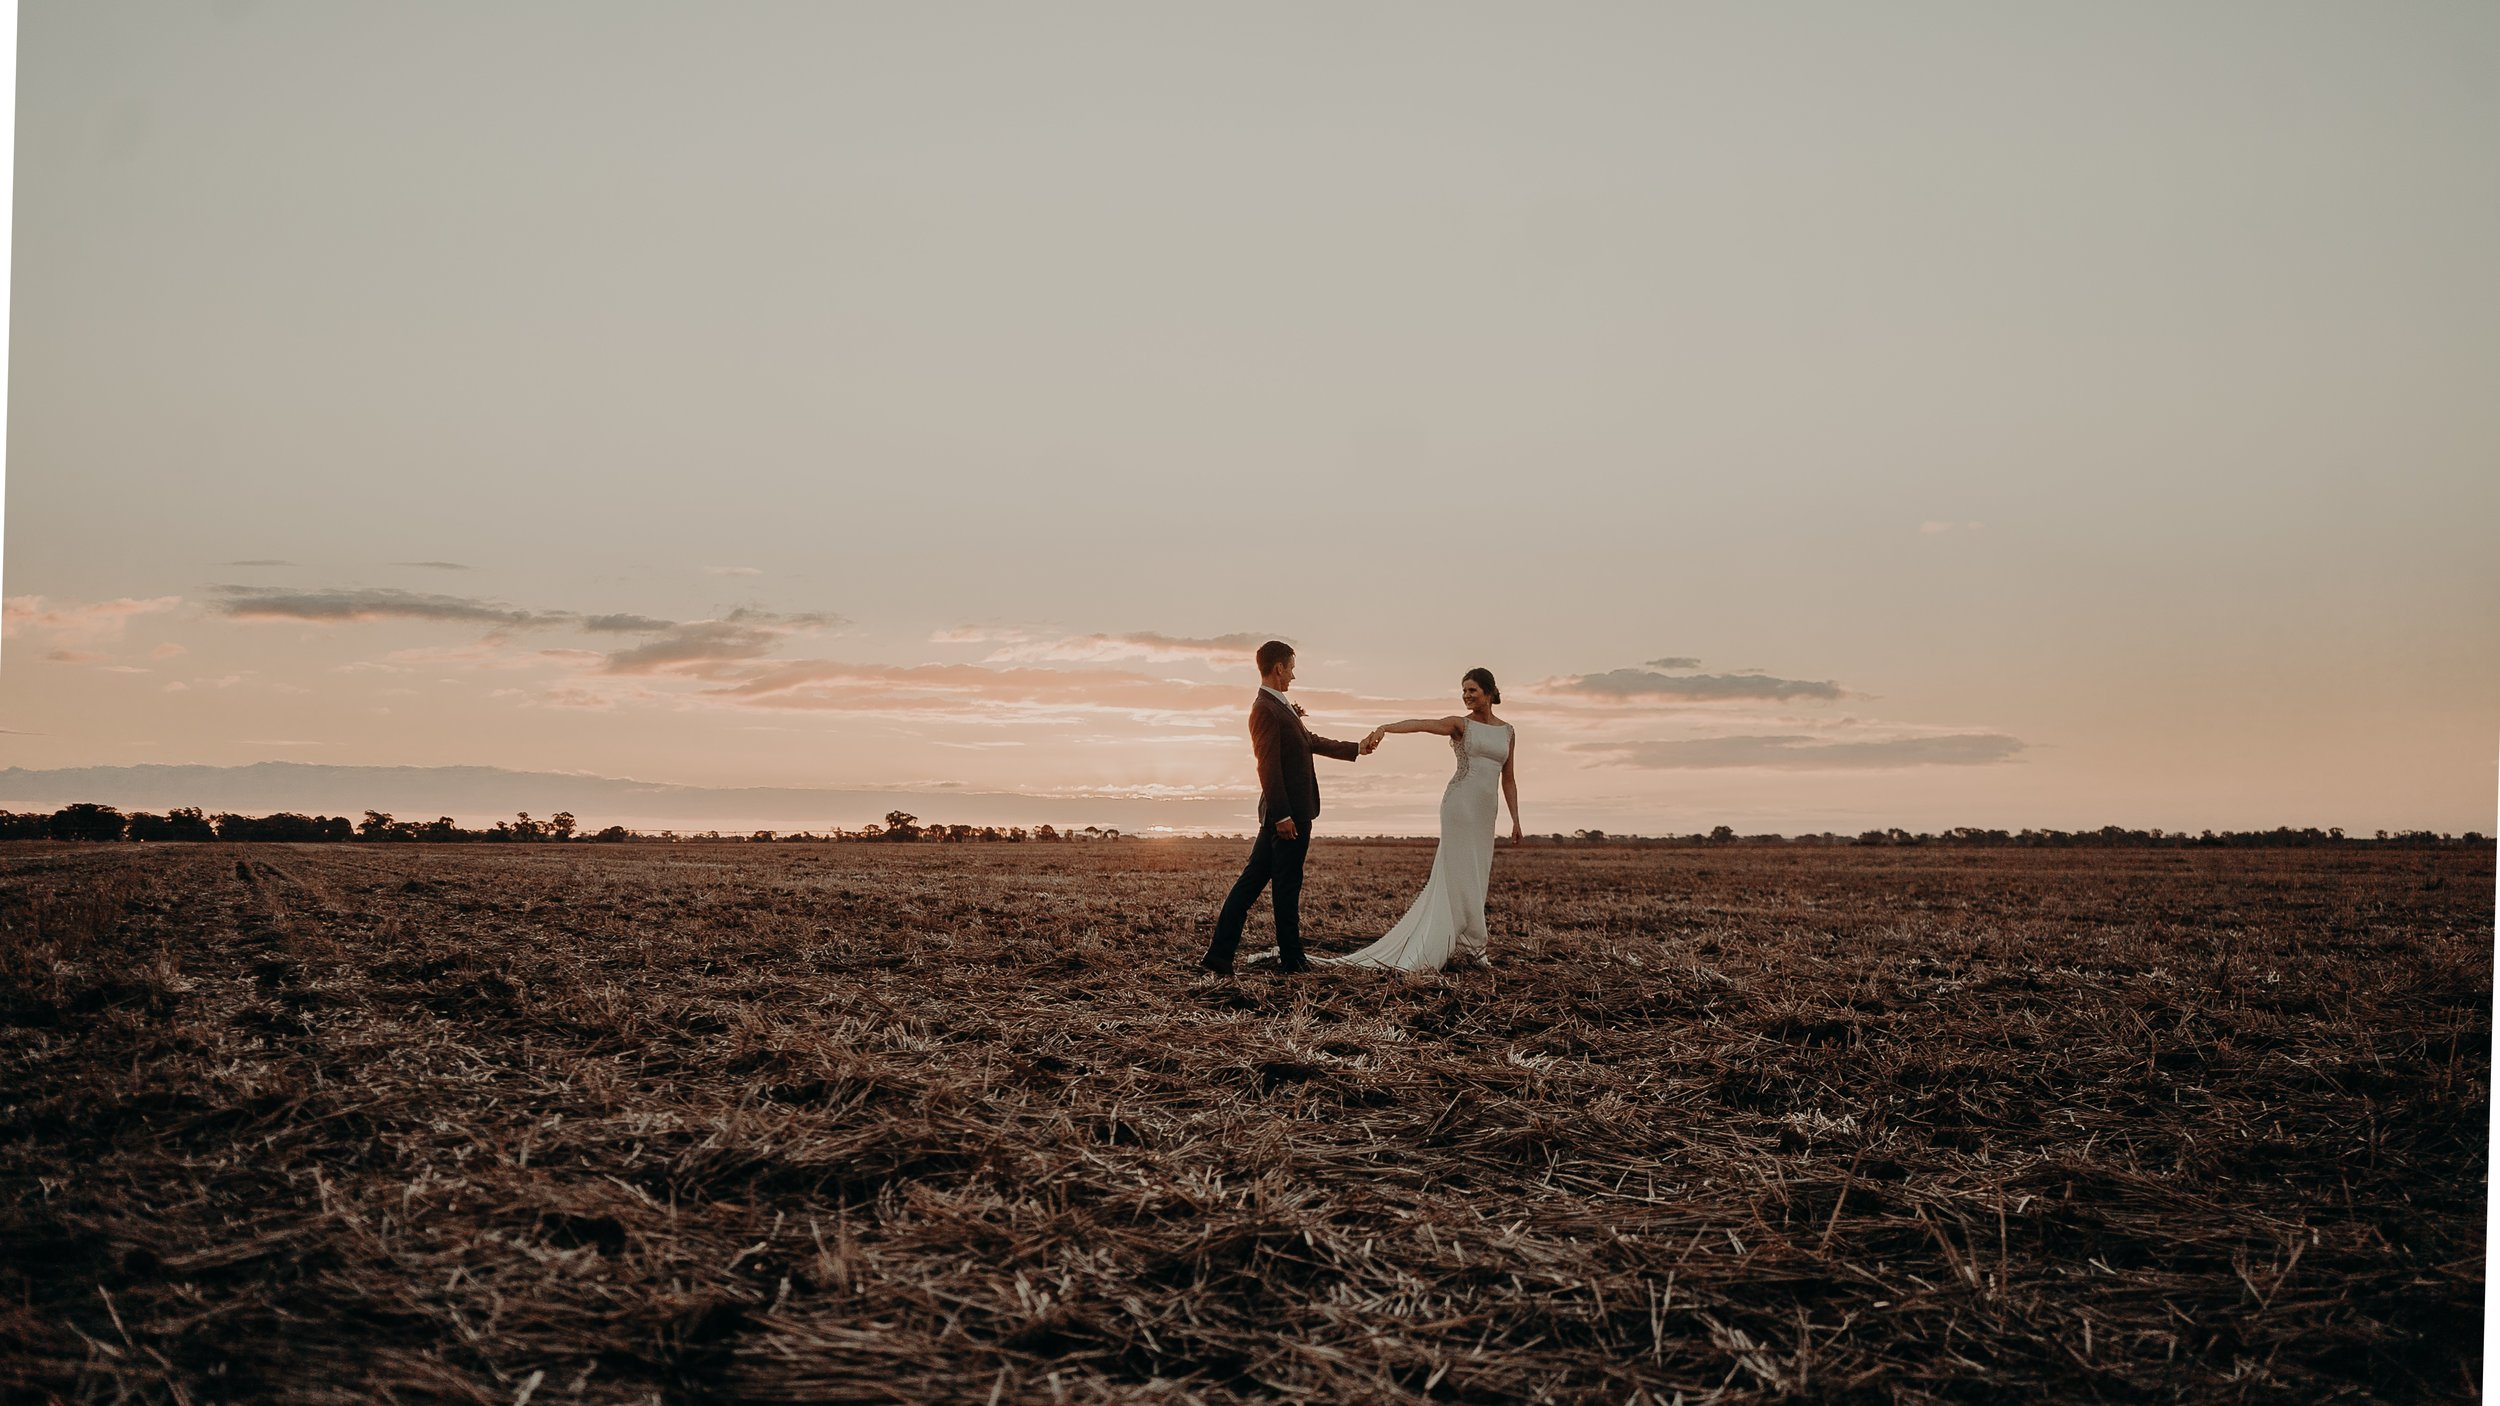 mickalathomas_puremacphotography_weddingphotographer_couplephotographer_Sheppartonphotographer_2577.jpg